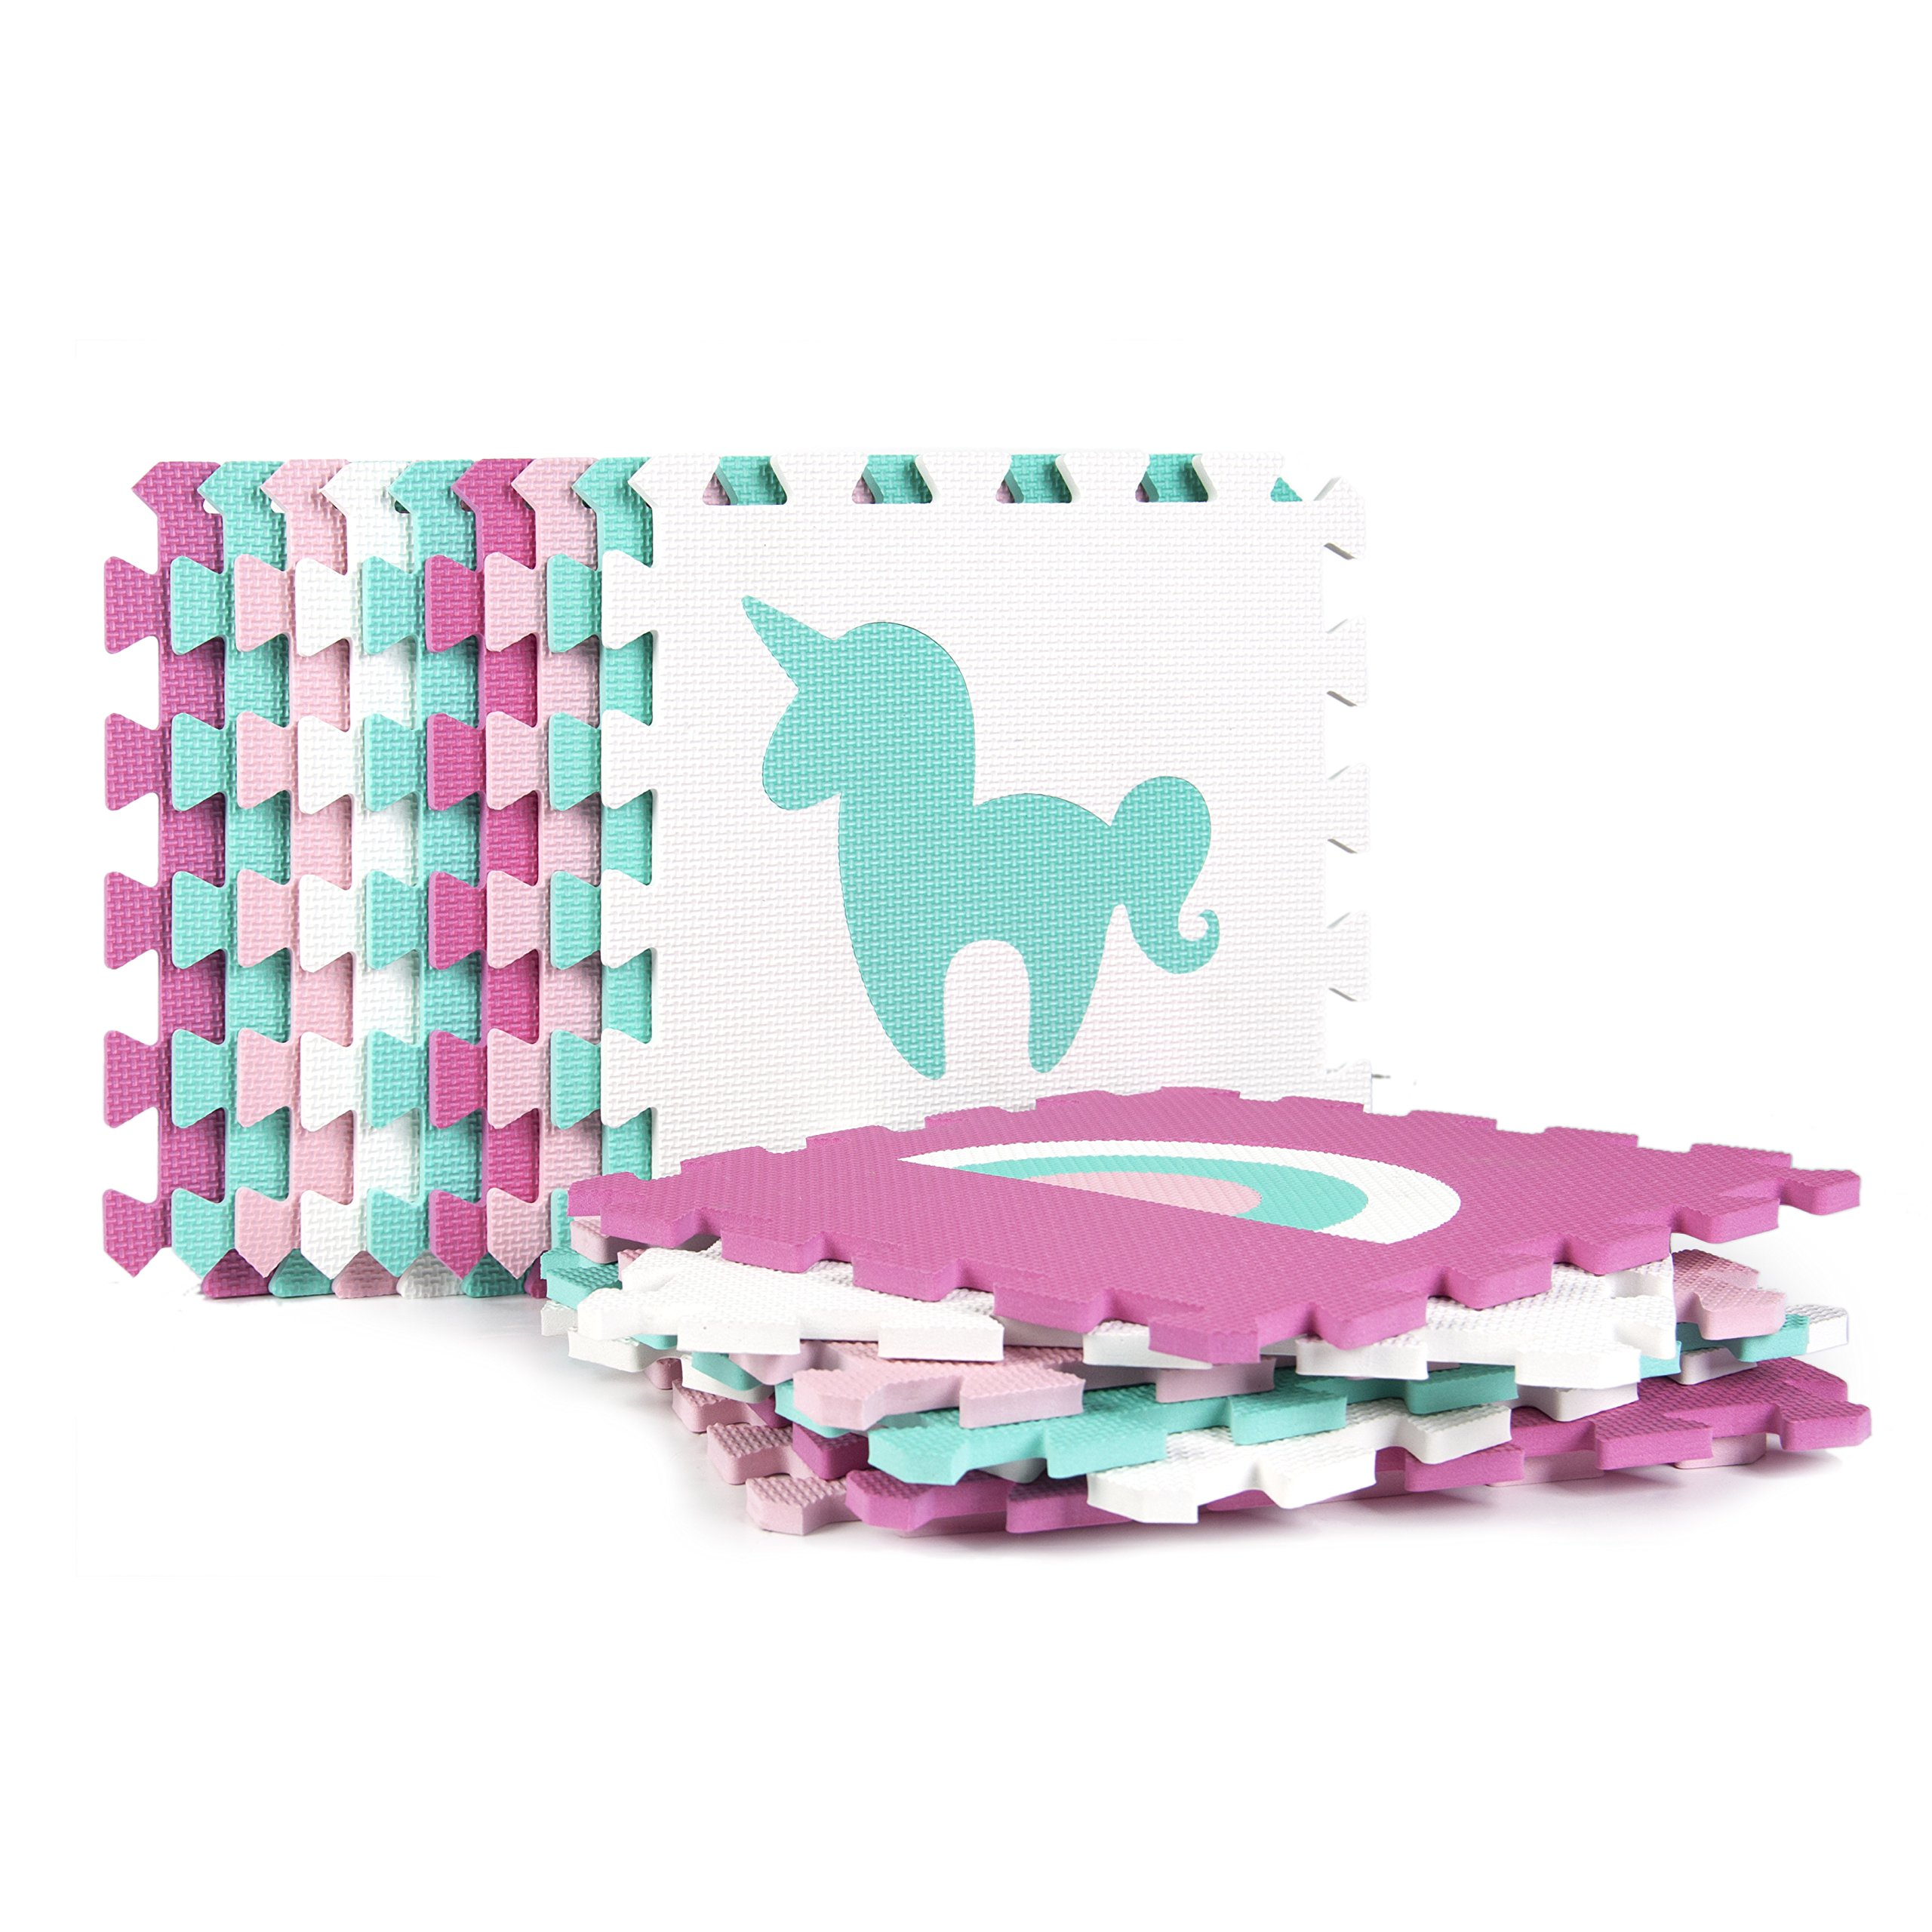 Tadpoles Soft EVA Foam 16pc Playmat Set, Unicorns and Rainbows, Pink, 50''x50'' by Tadpoles (Image #2)